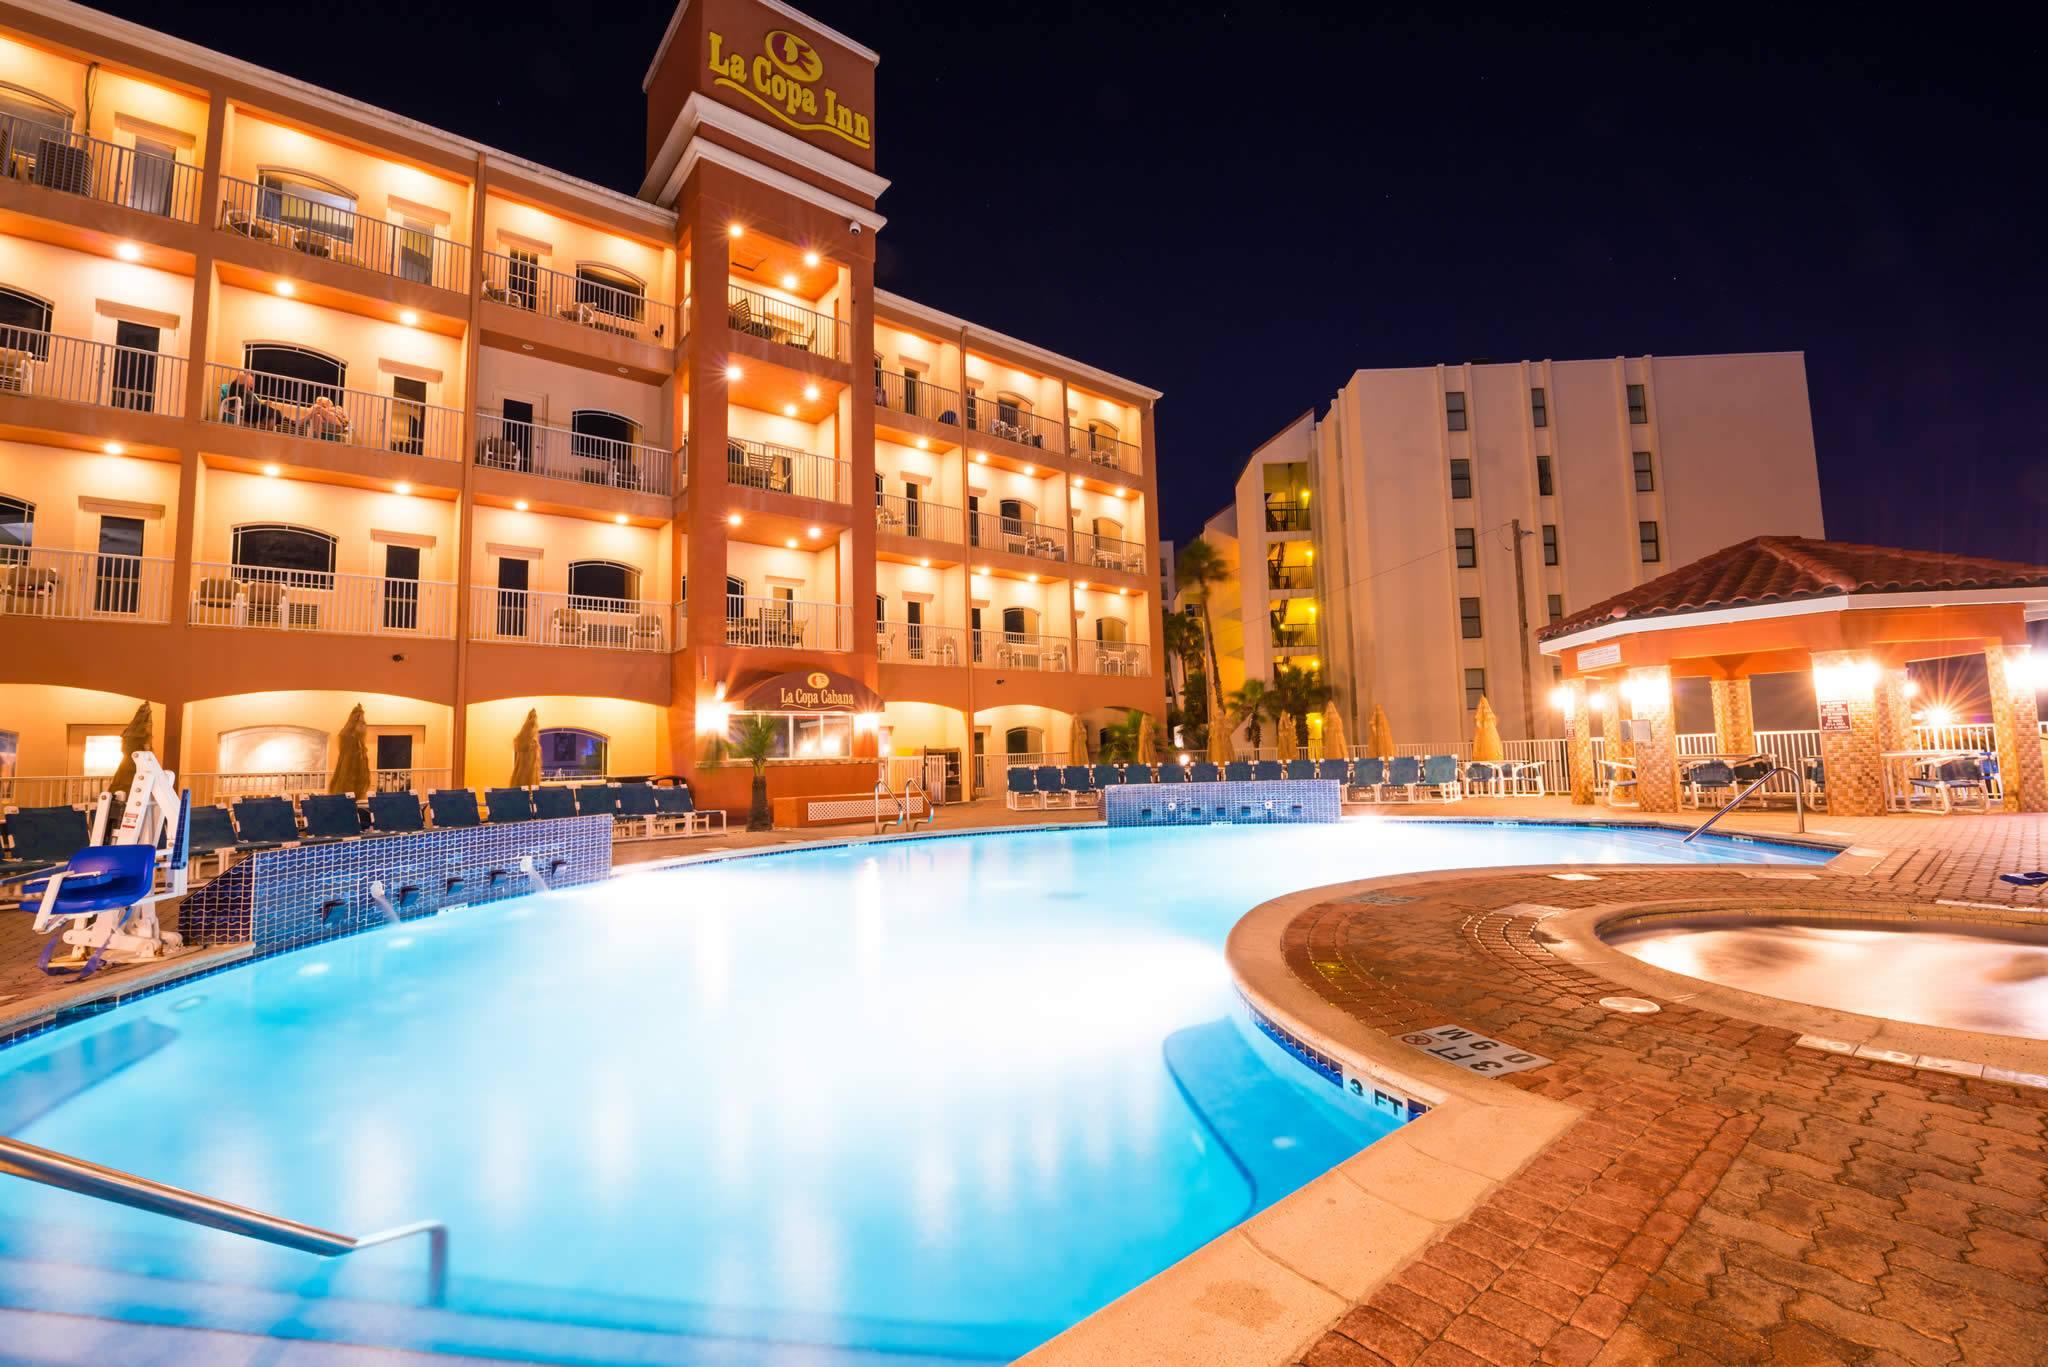 Hotels In South Padre Island >> La Copa Inn Beach Hotel Beachfront Hotel On South Padre